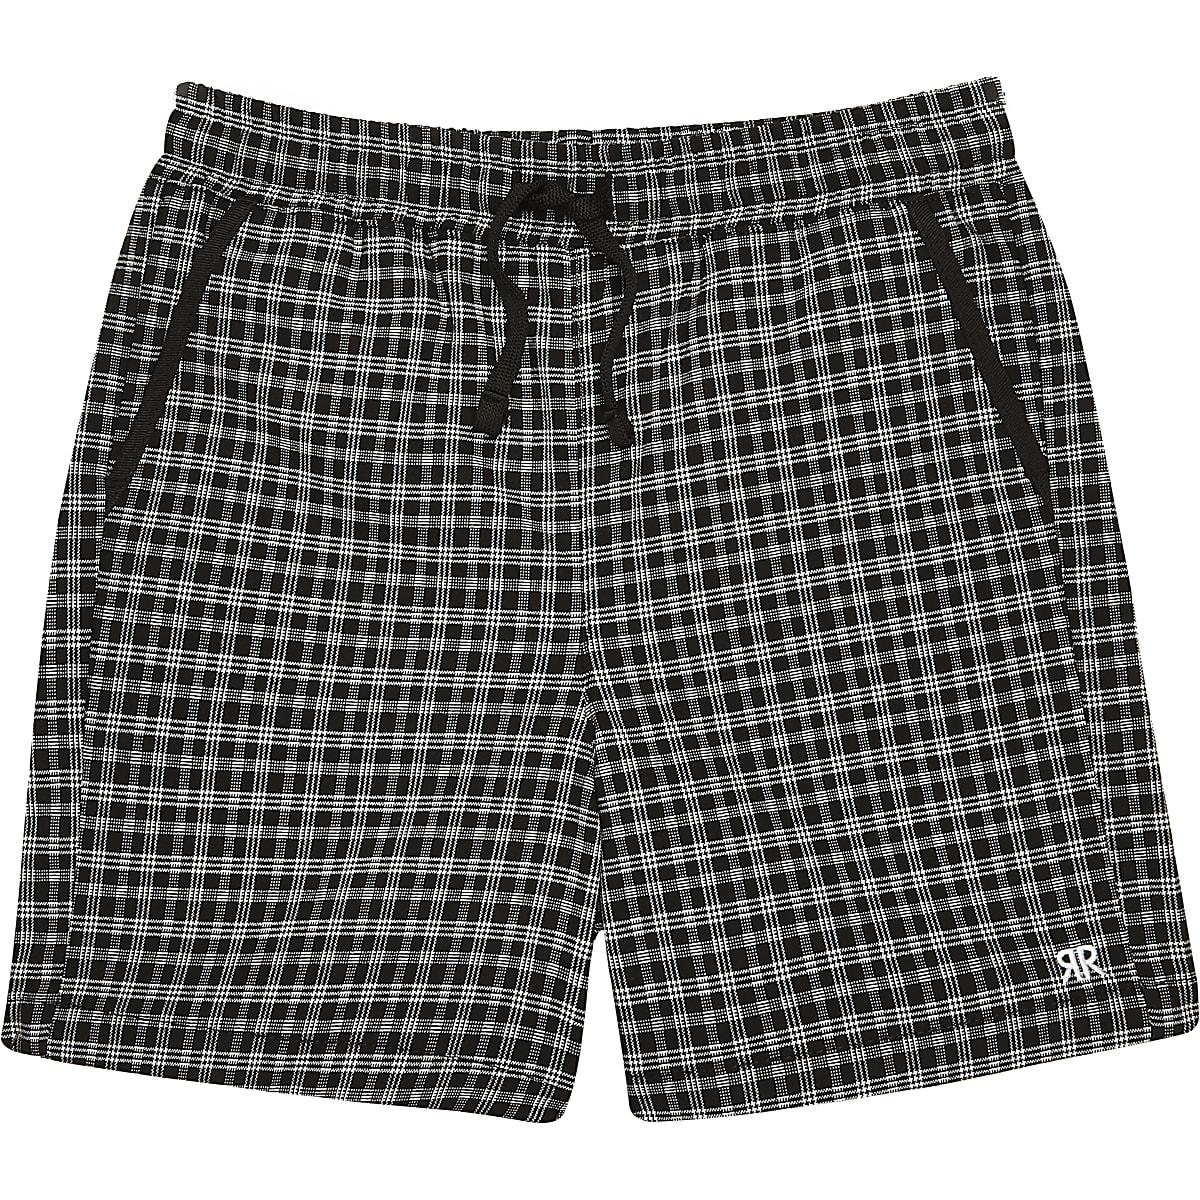 Schwarze, karierte Shorts